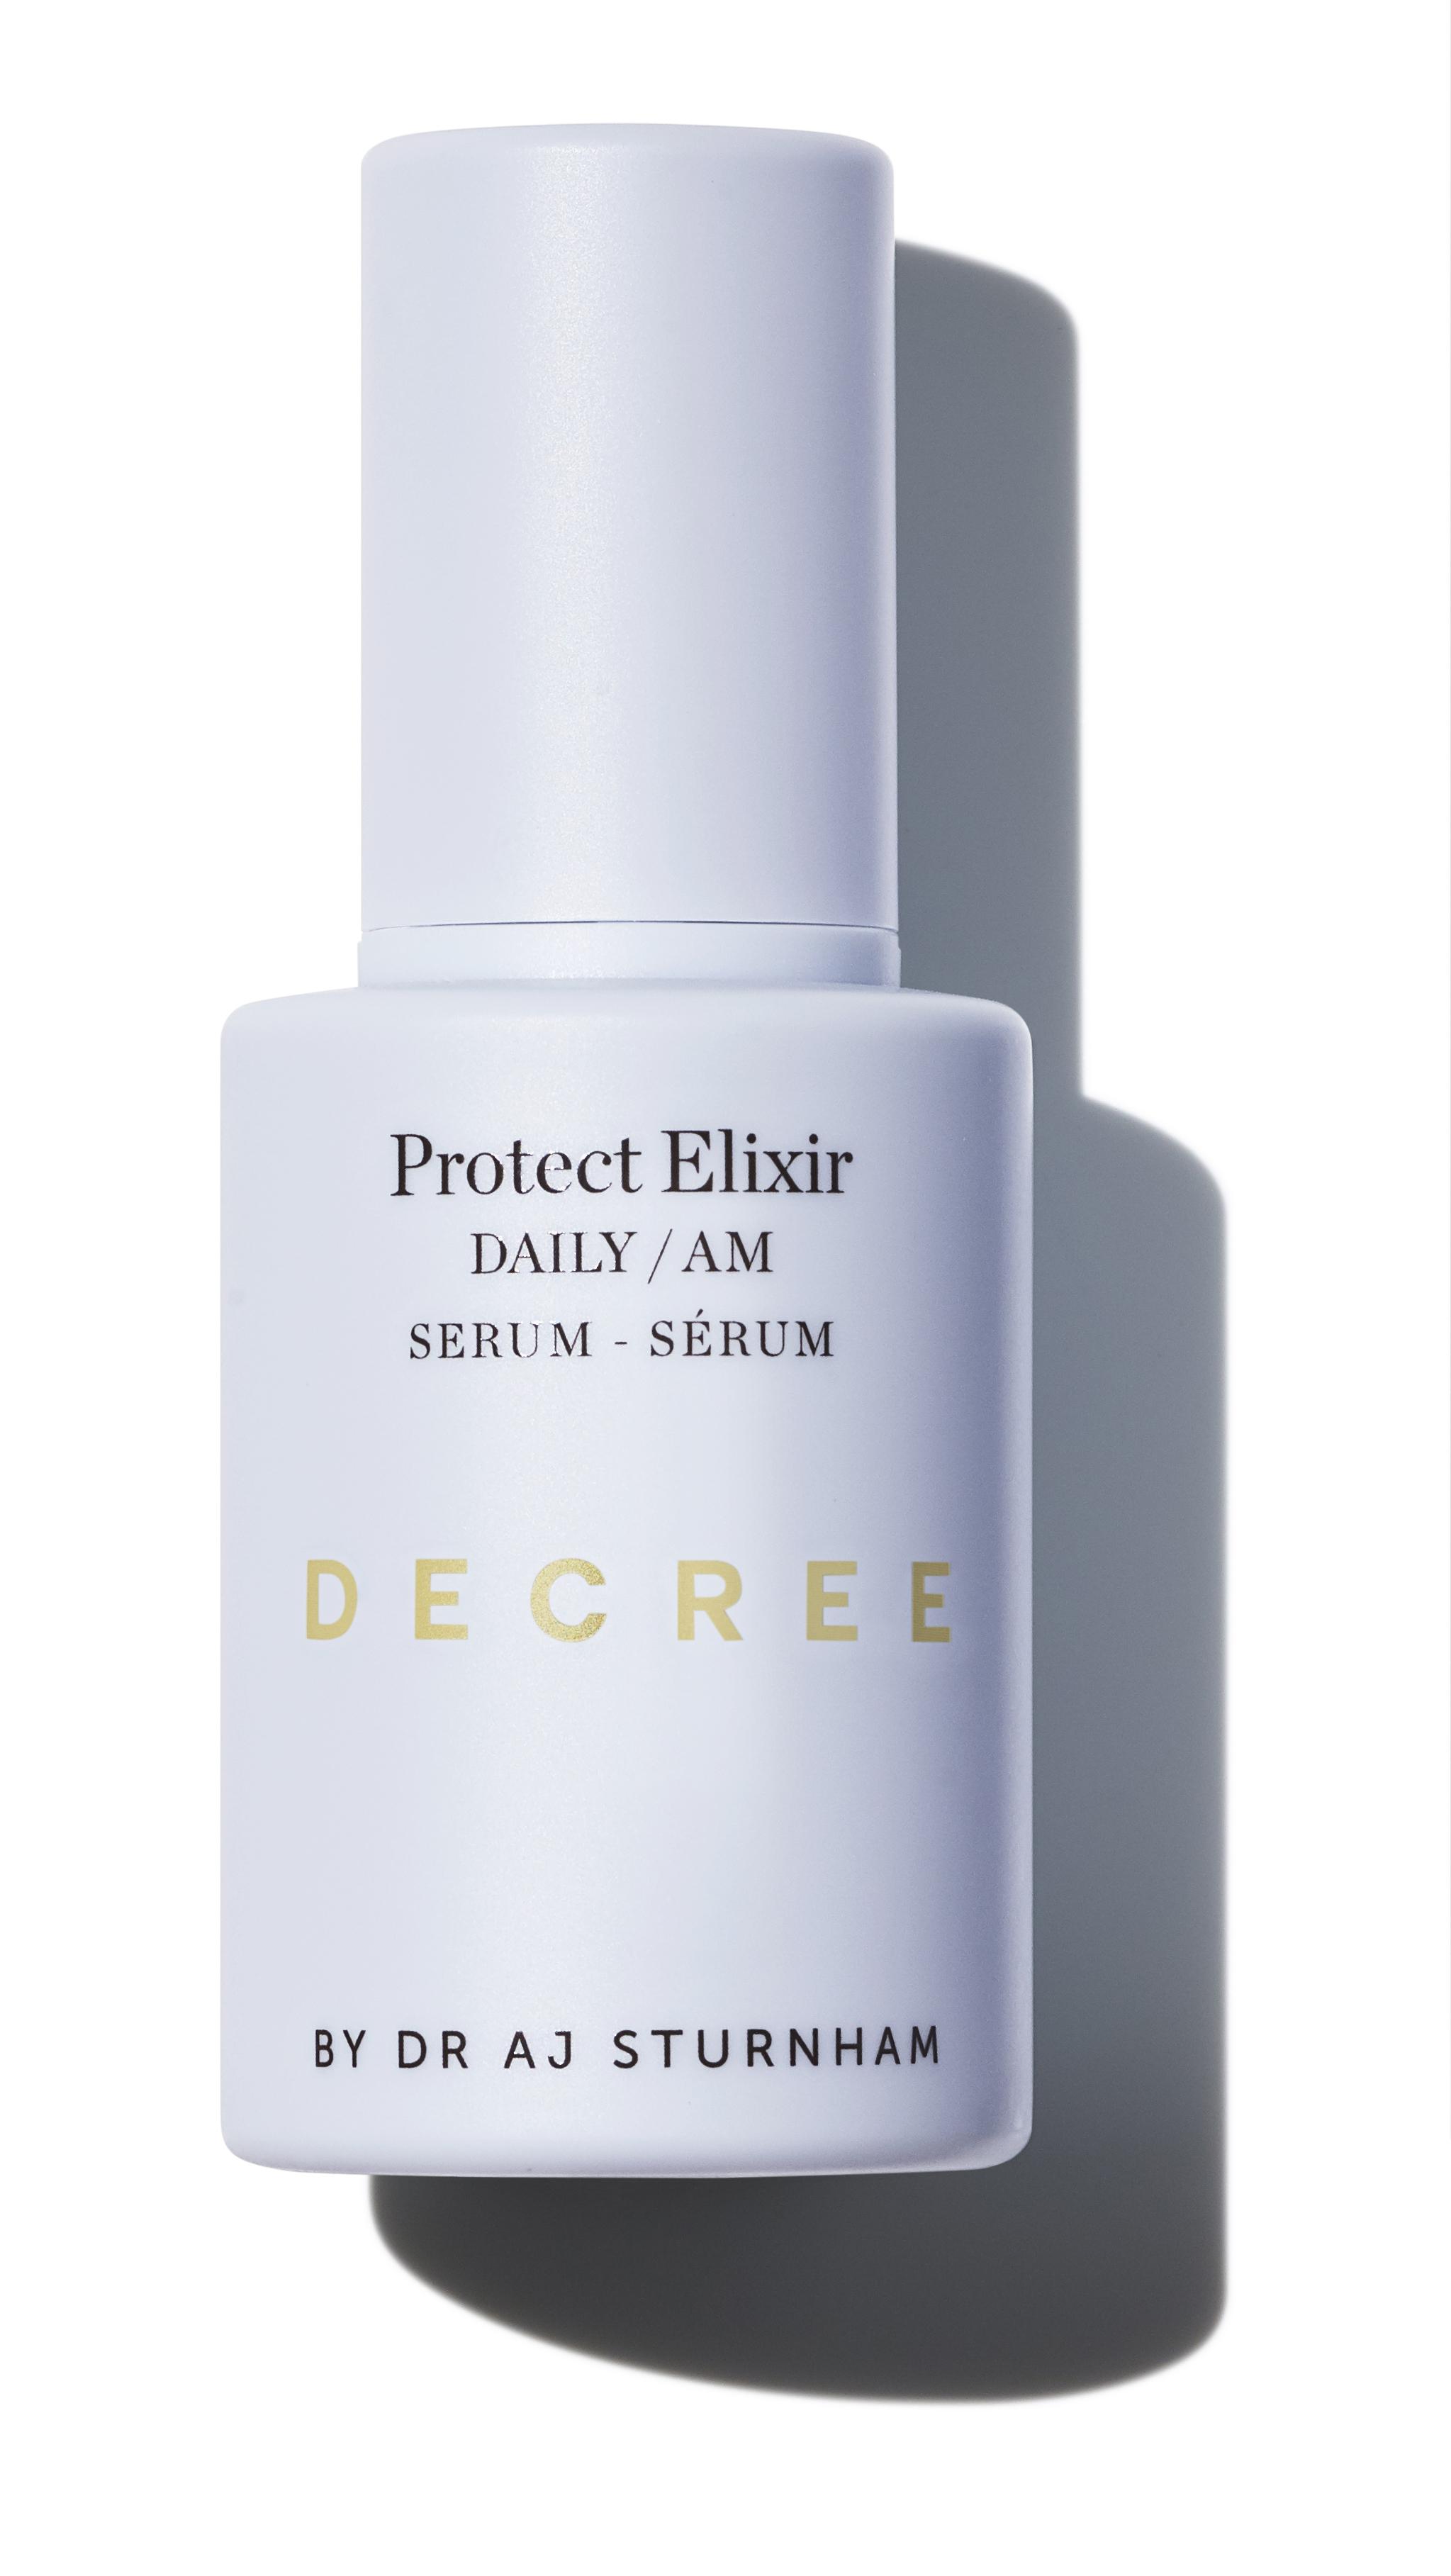 Decree Protect Elixir